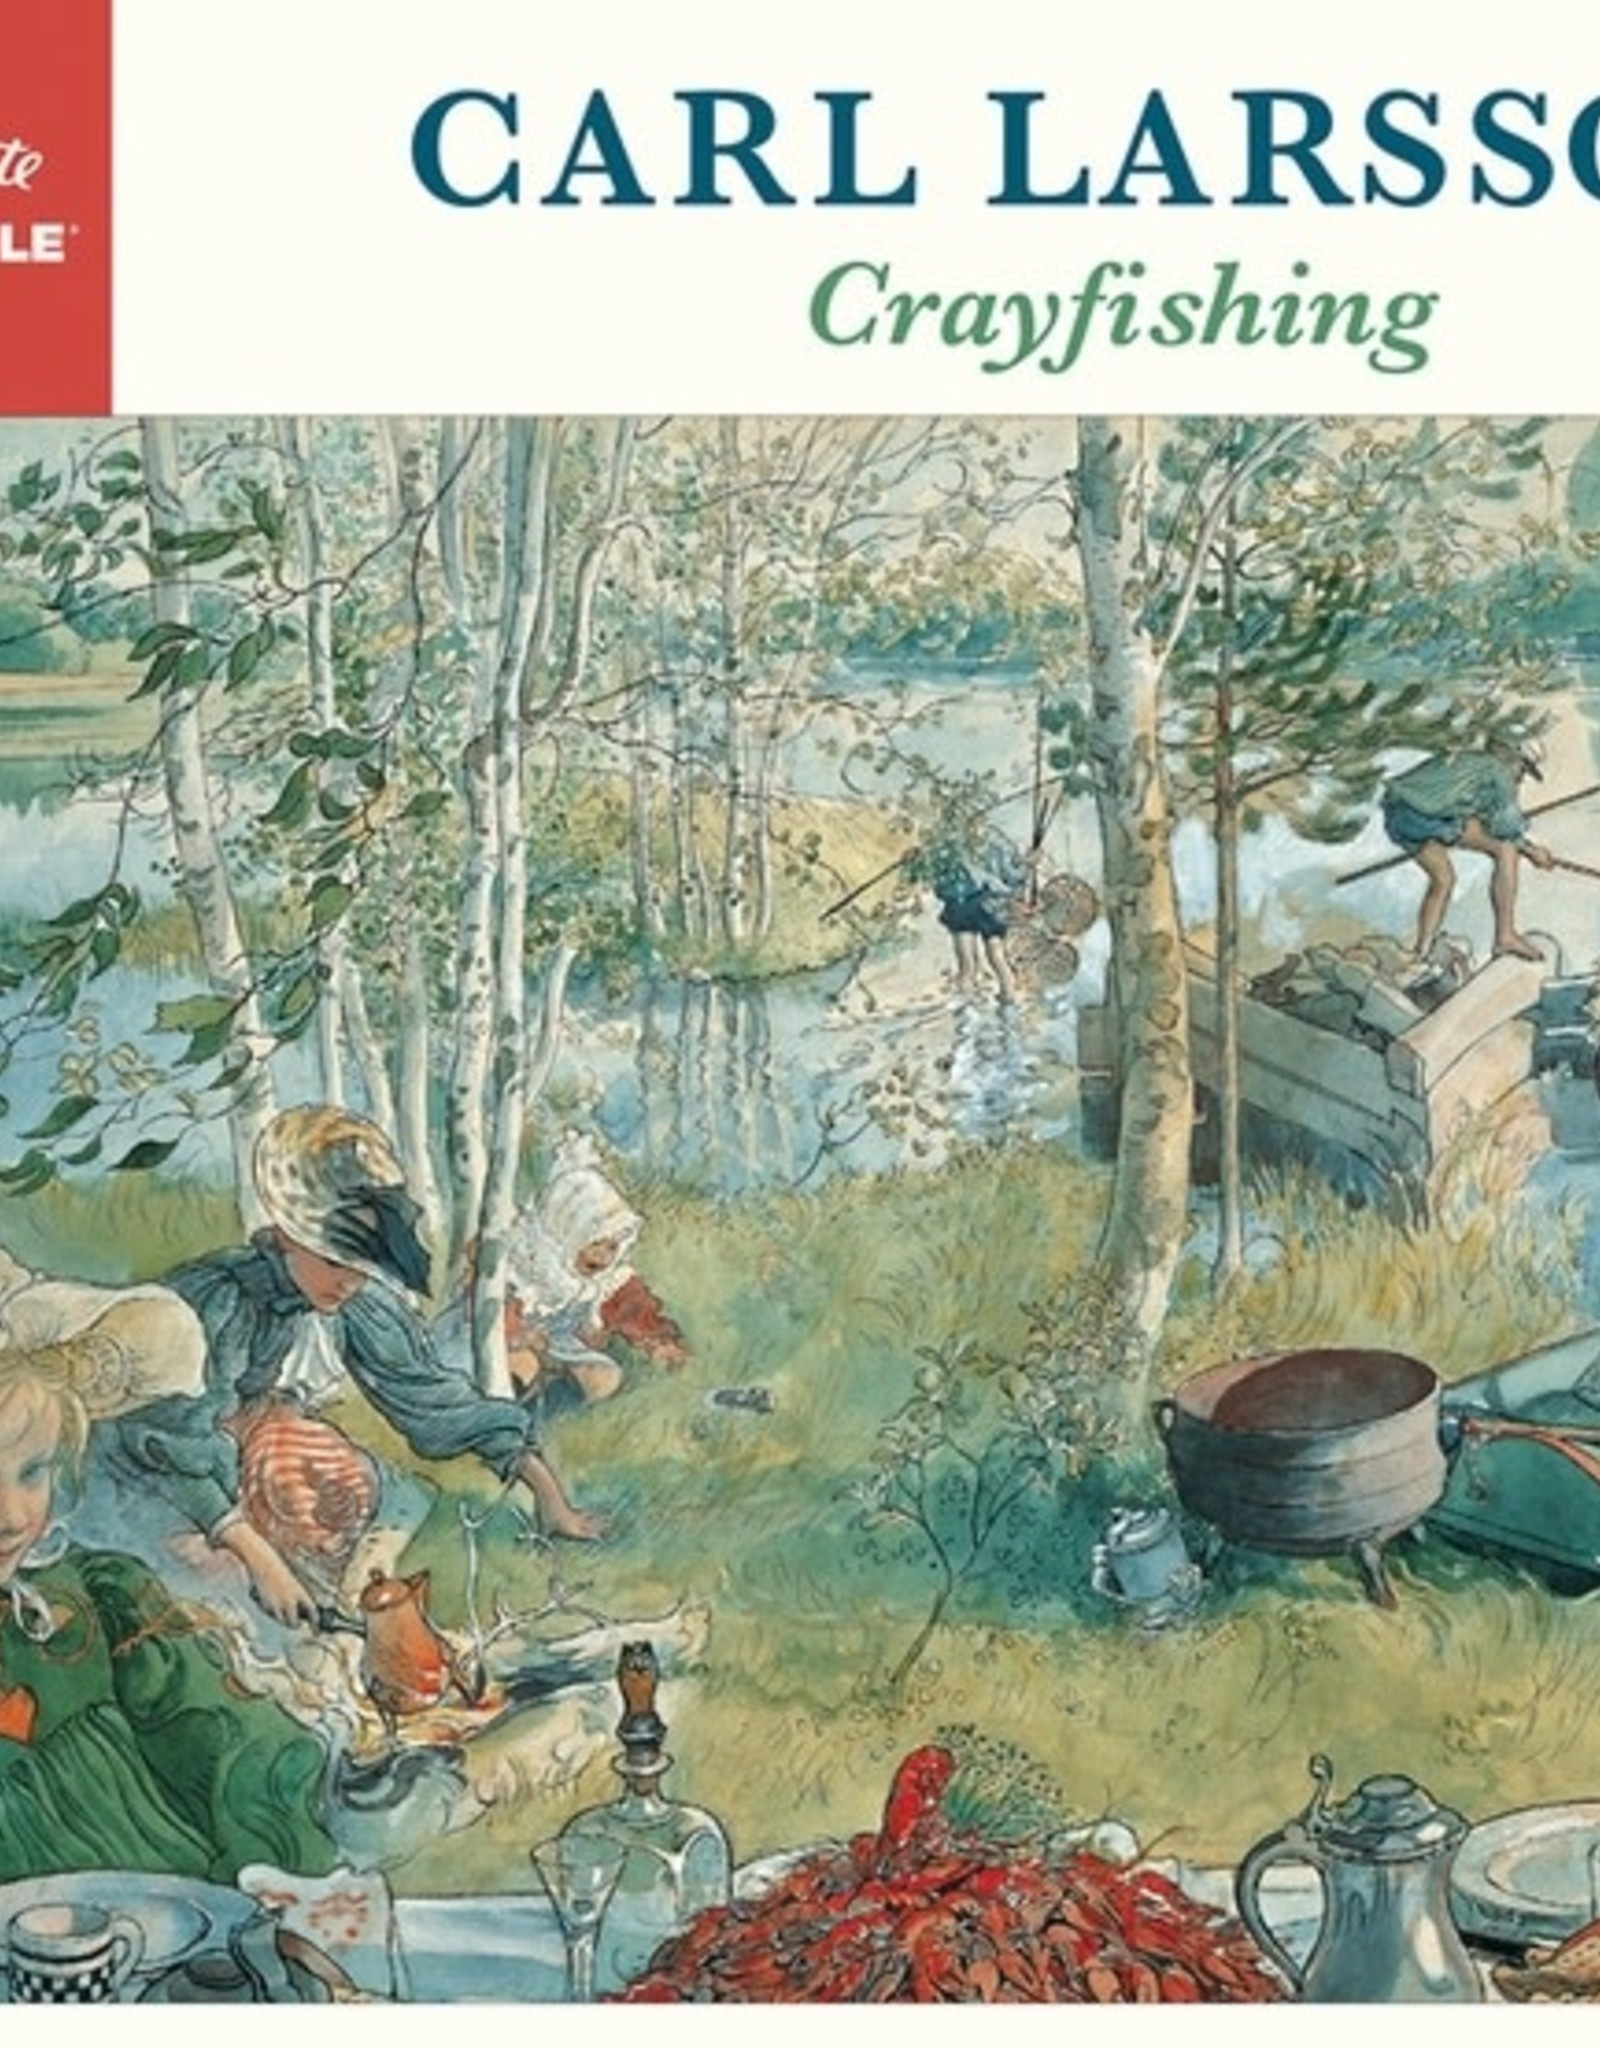 Pomegranate 1000 pc Carl Larsson: Crayfishing Puzzle